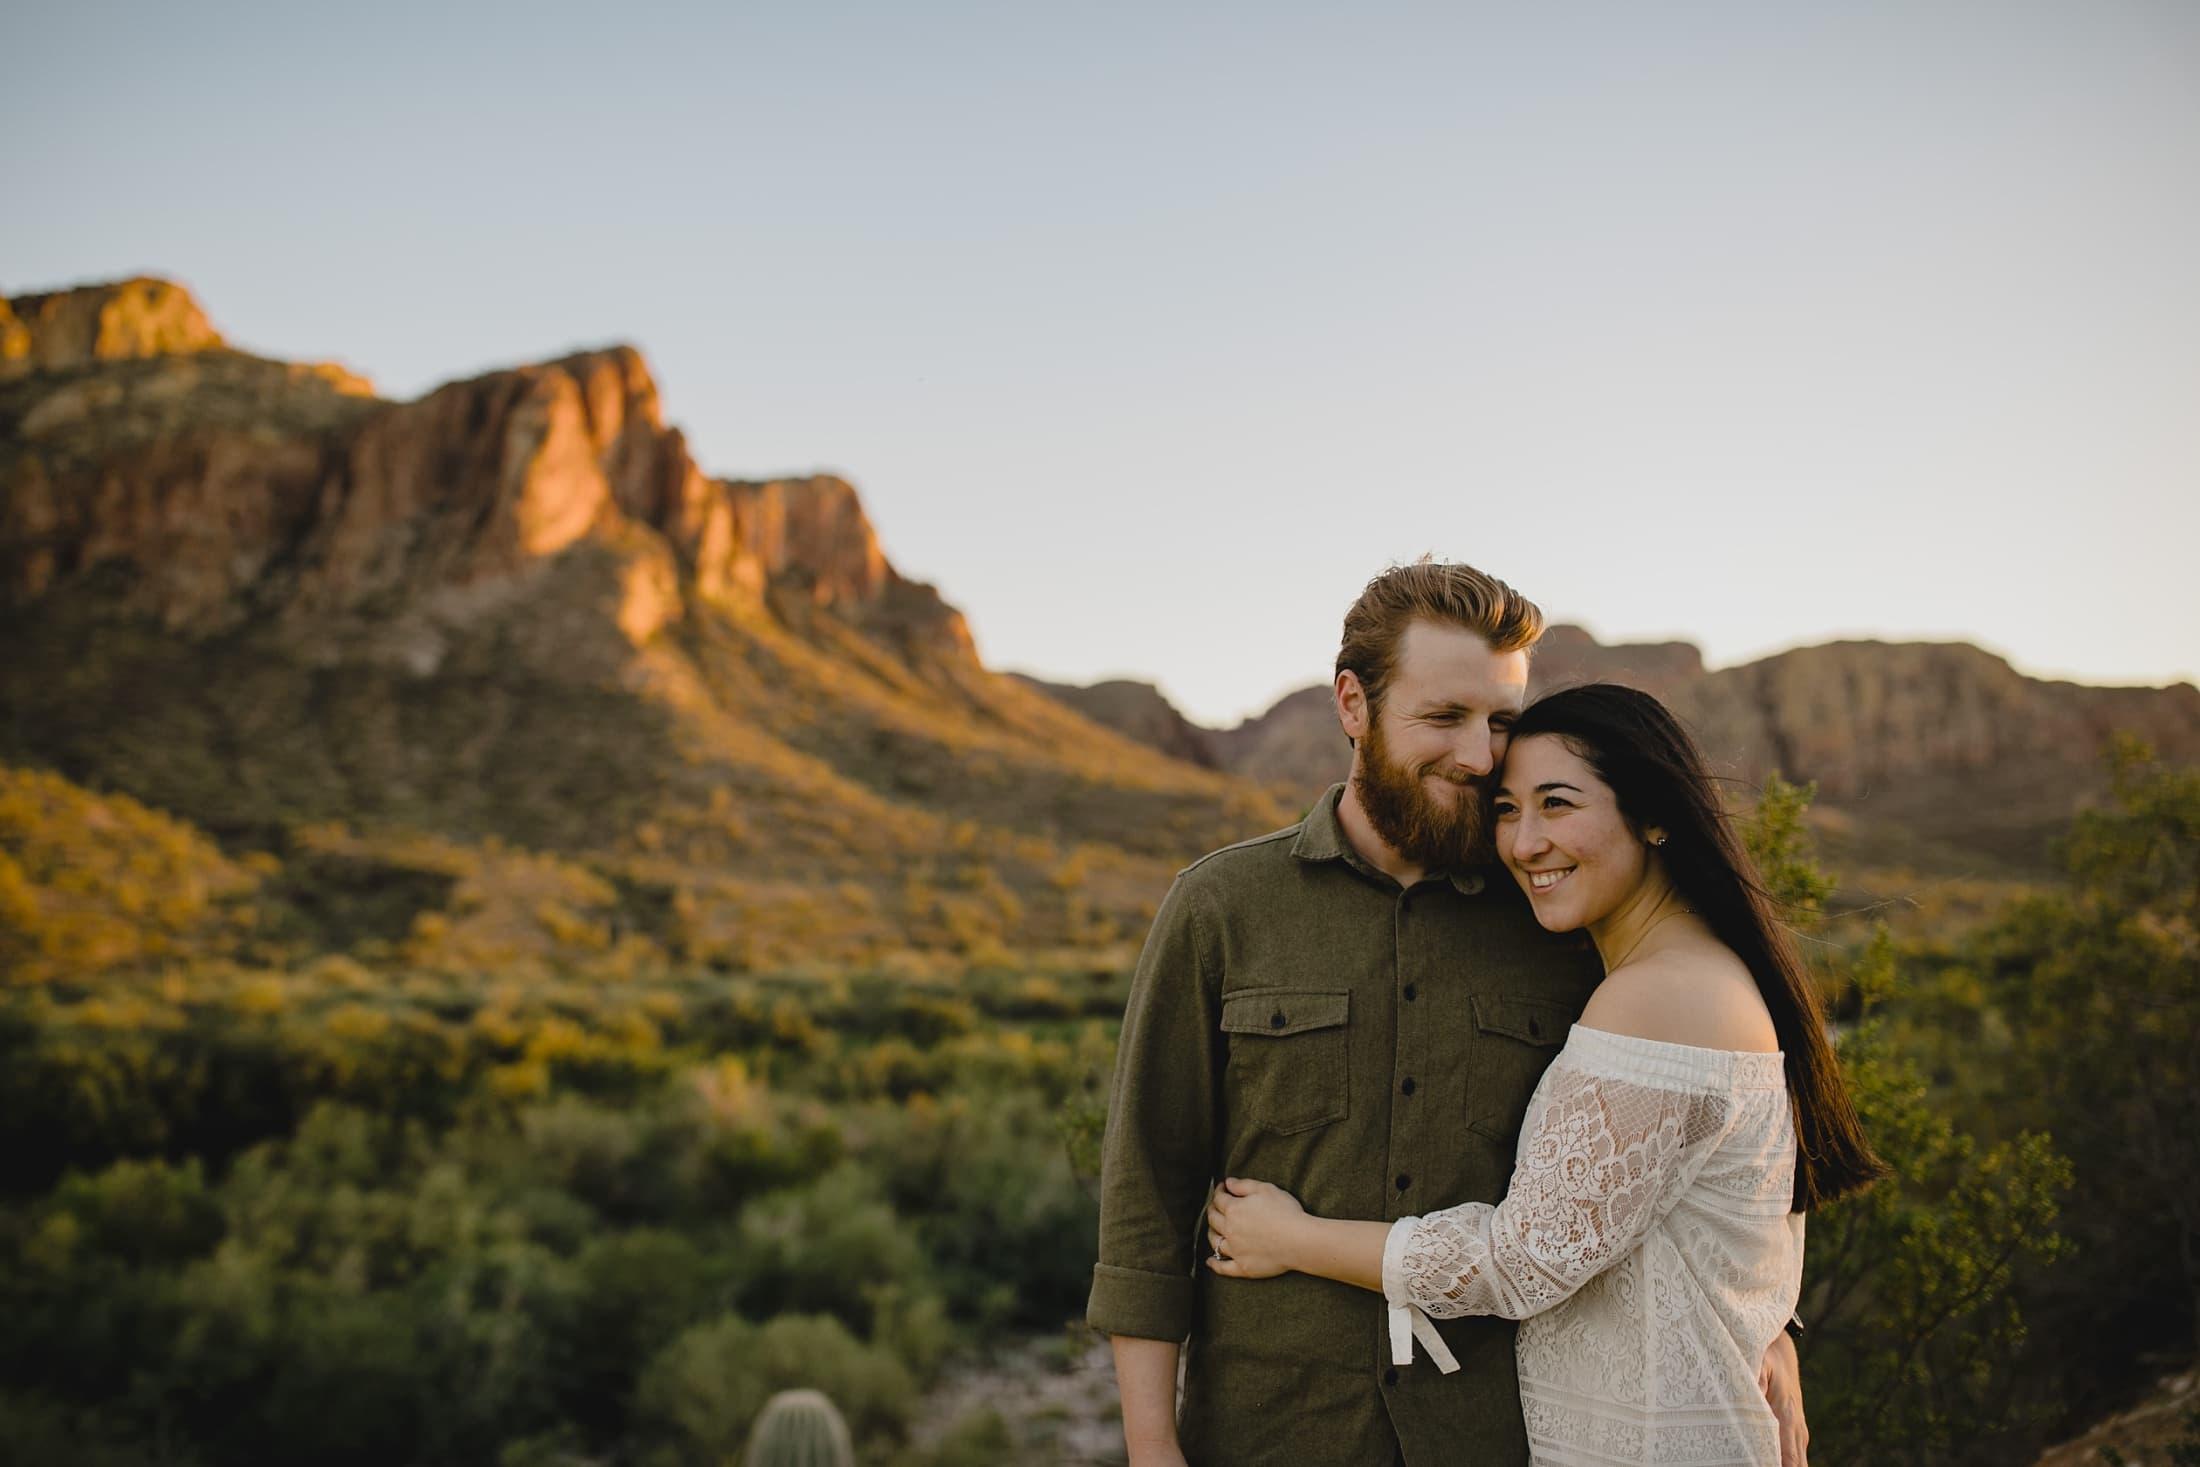 boho natural authentic engagement photos in Arizona